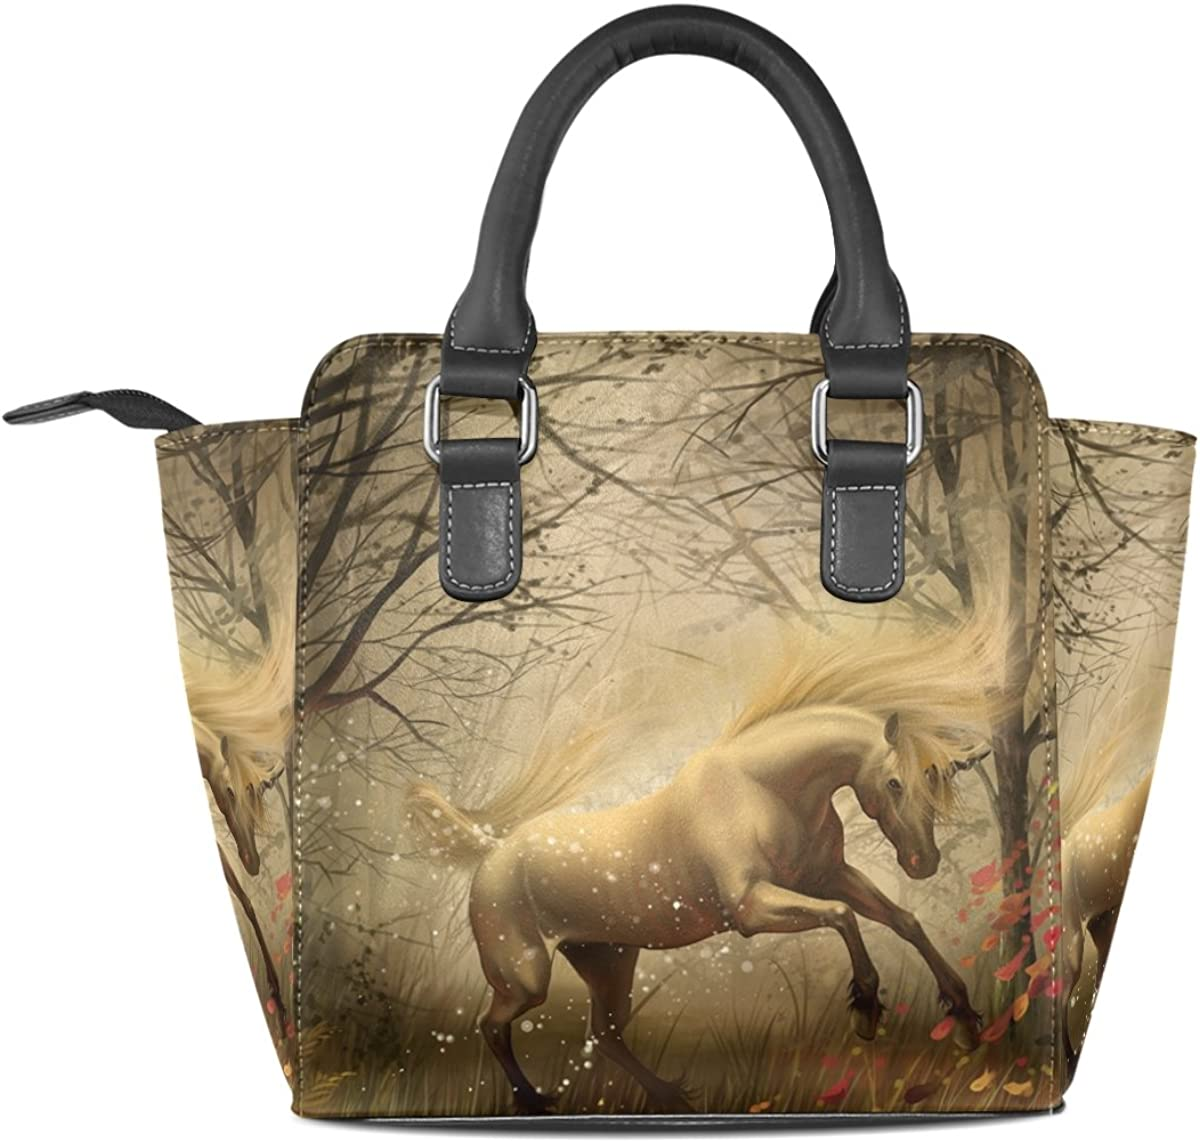 Jennifer PU Leather Top-Handle Handbags Unicorn In Forest Single-Shoulder Tote Crossbody Bag Messenger Bags For Women